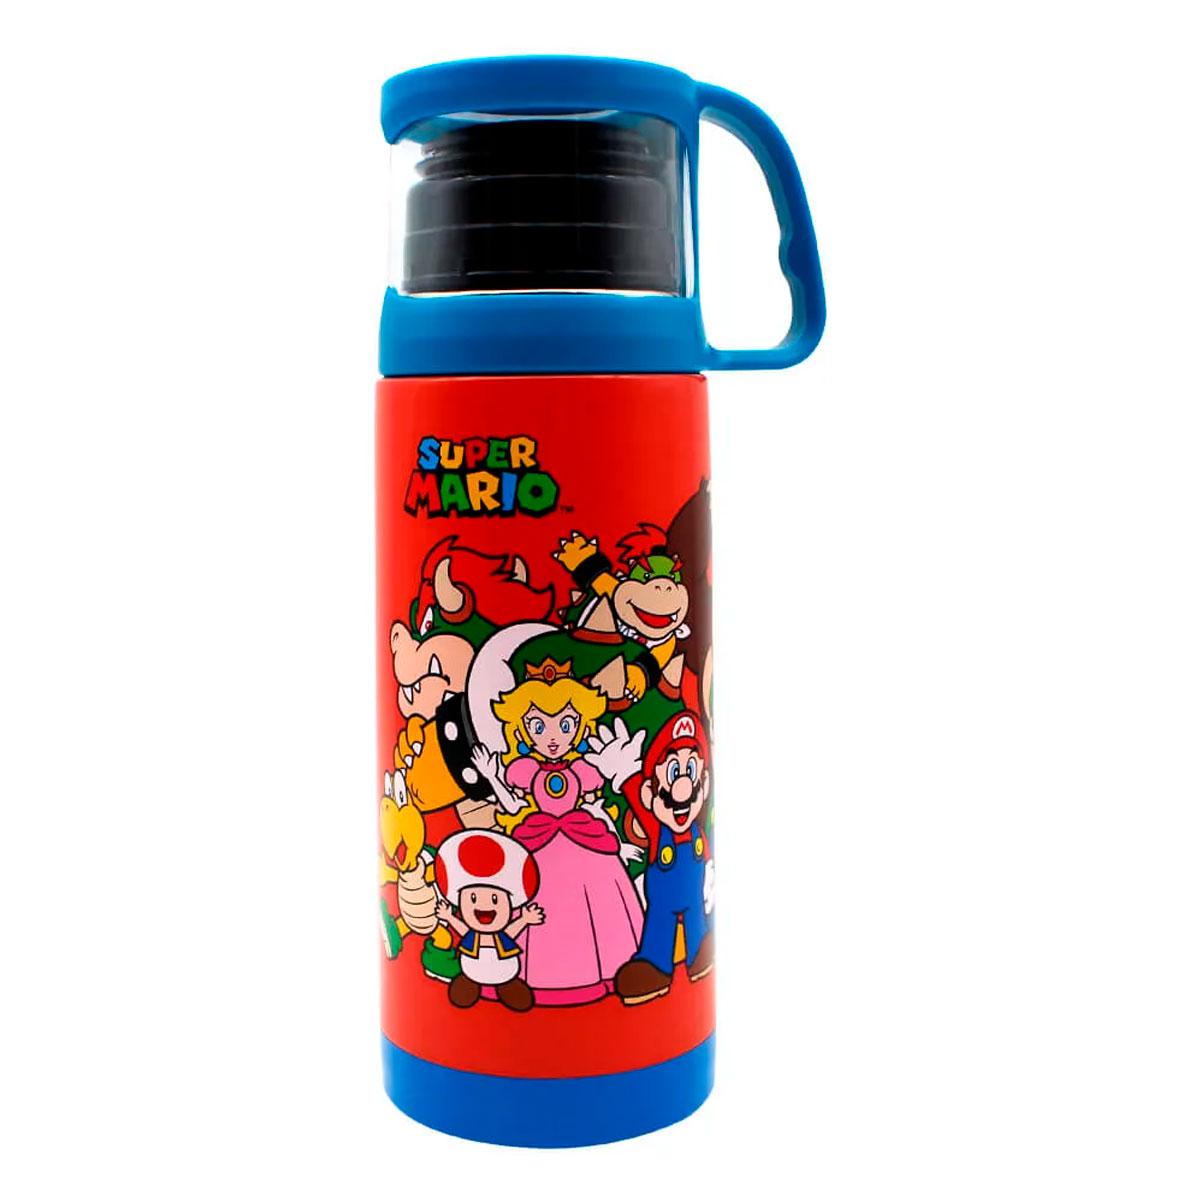 Garrafa Térmica 350 ml com Xícara Super Mario Turma - Presente Super